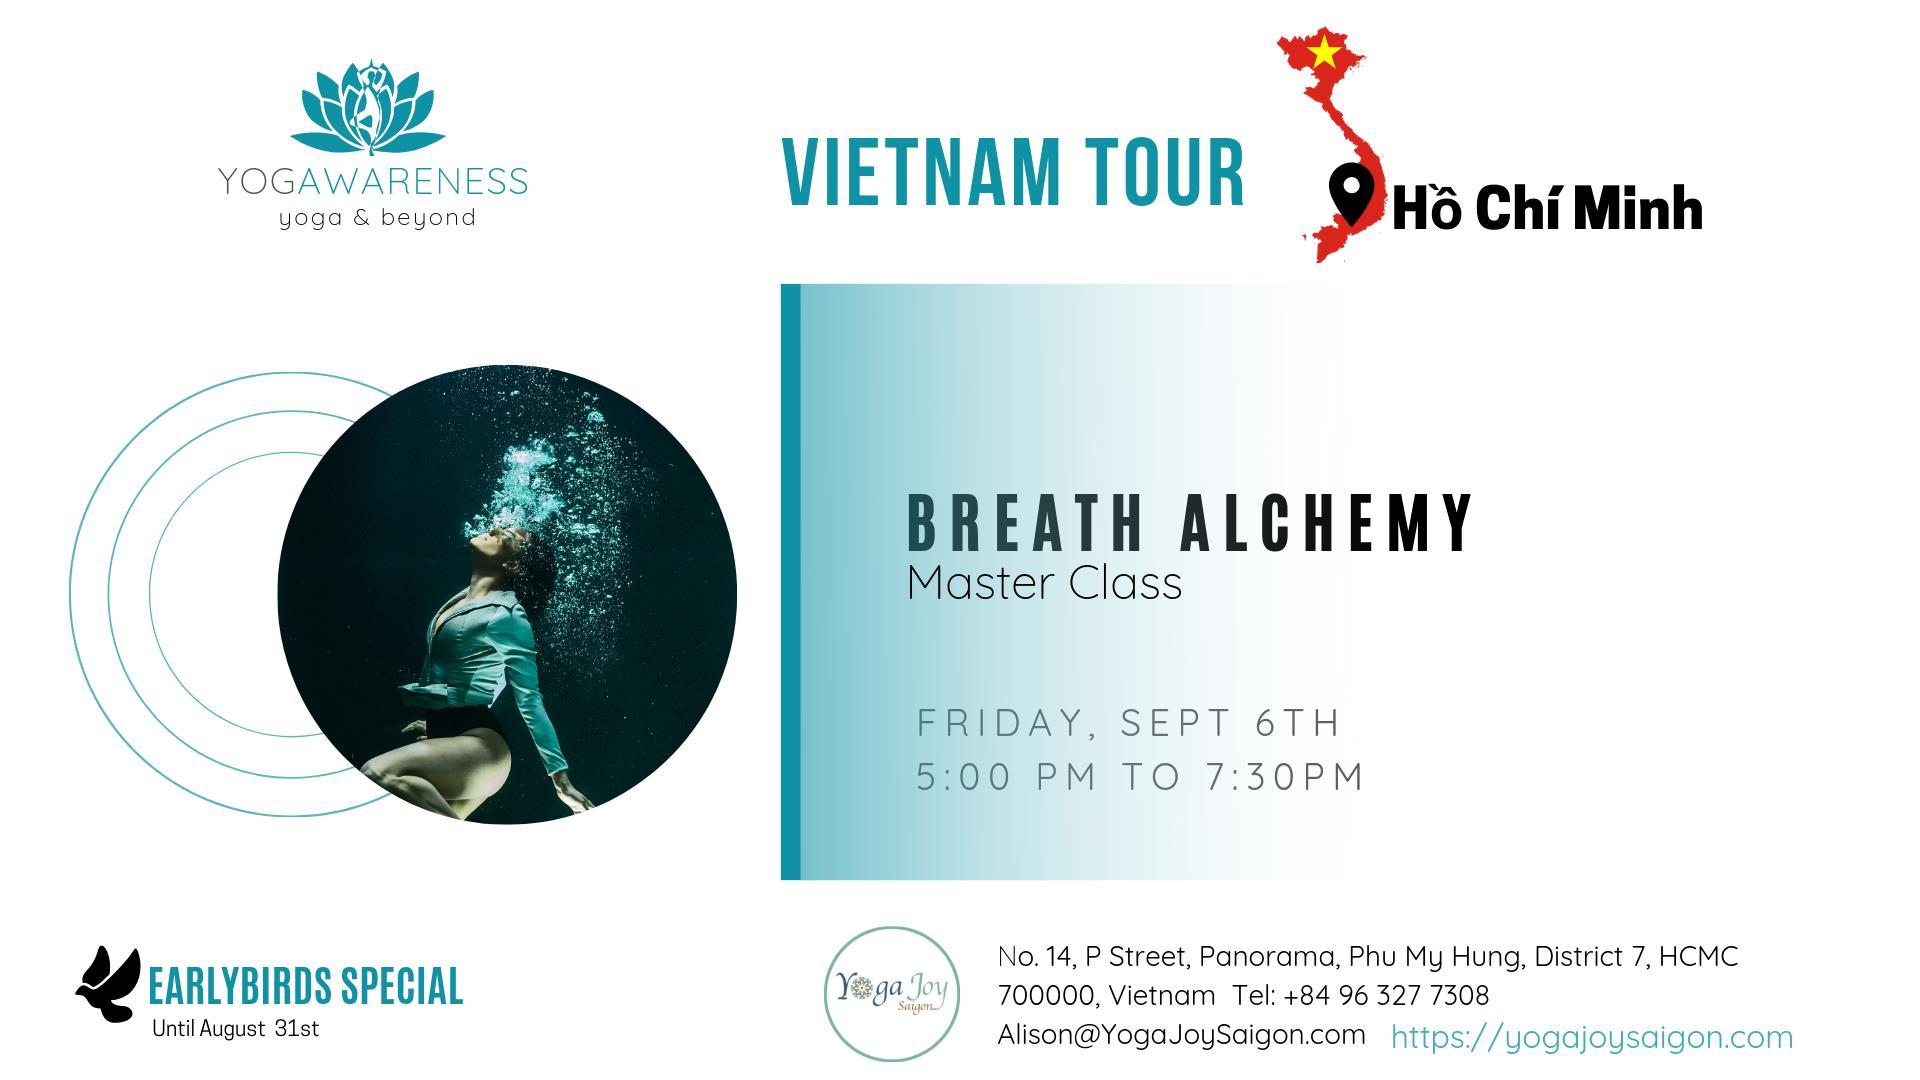 yogawareness-hcmc-tour-breath-alchemy.jpg